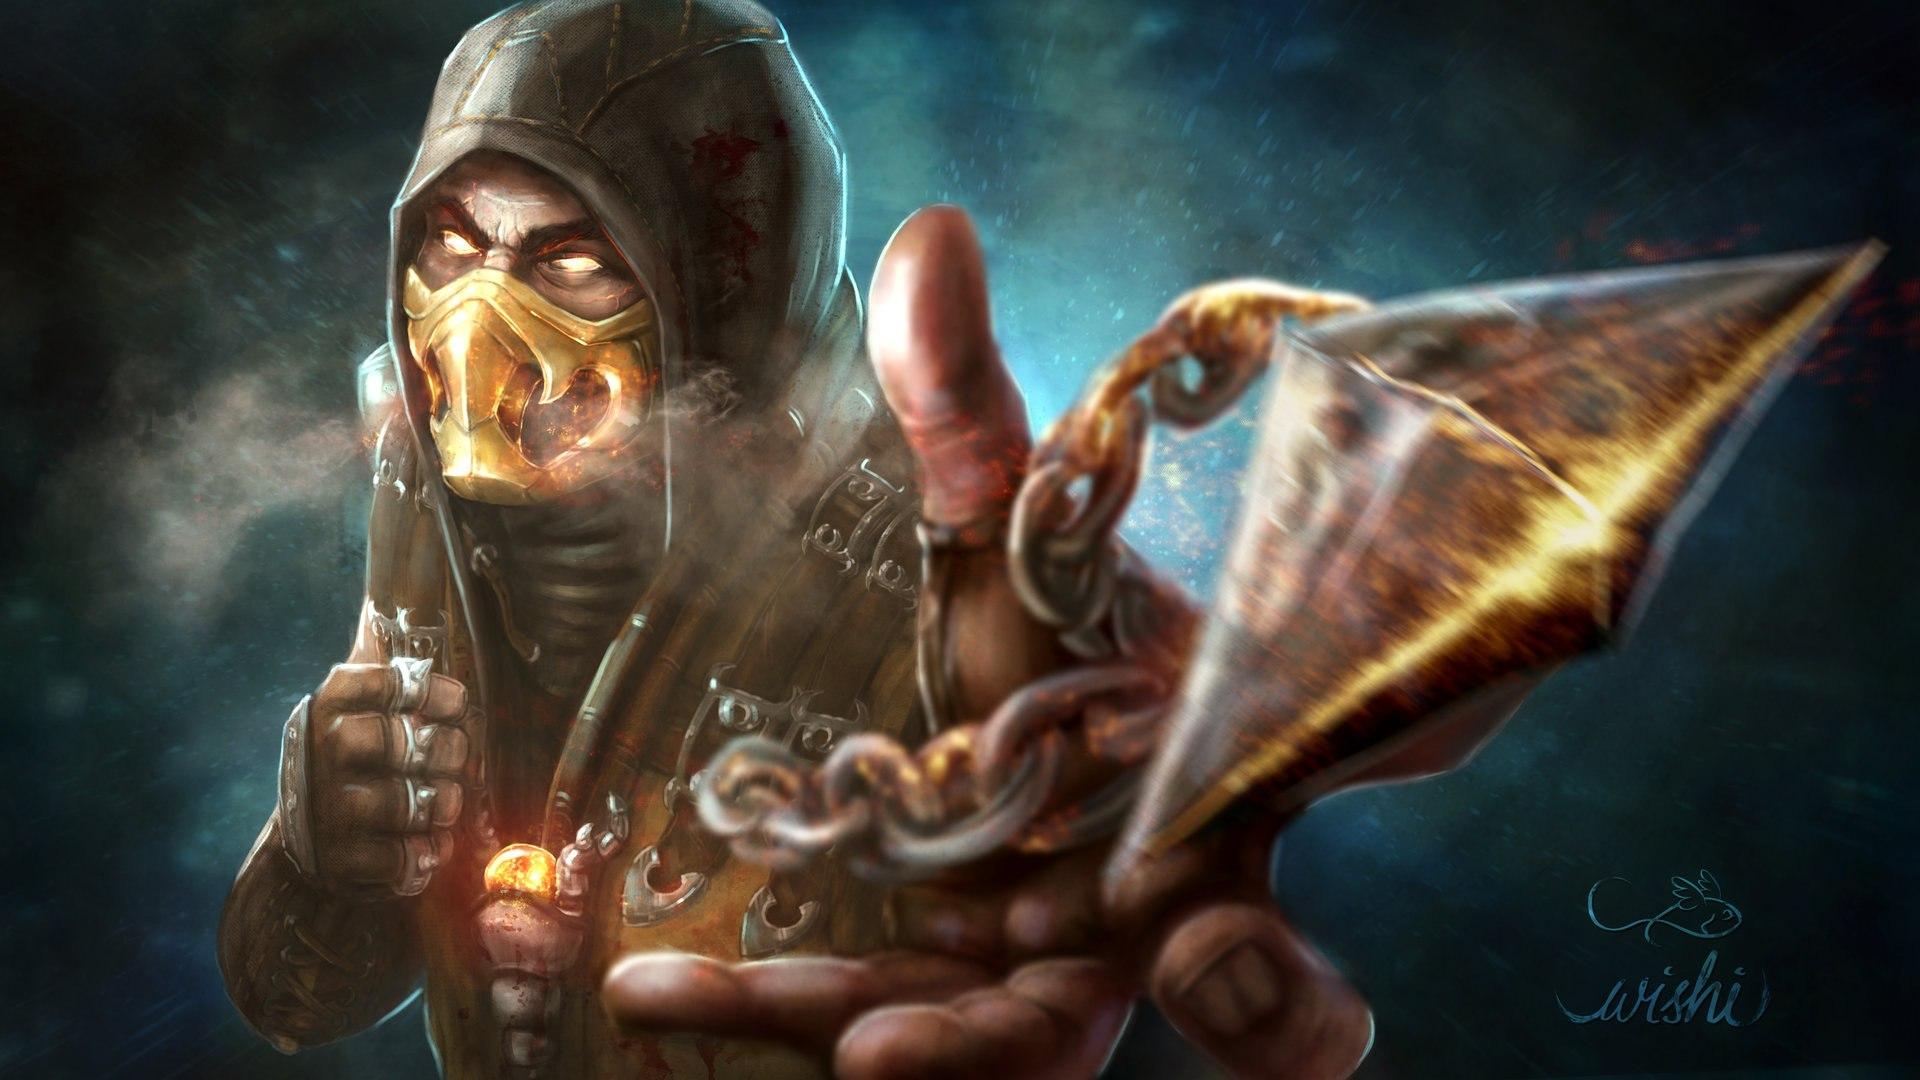 1431917347_zmSb_zxlj28.jpg - Mortal Kombat X